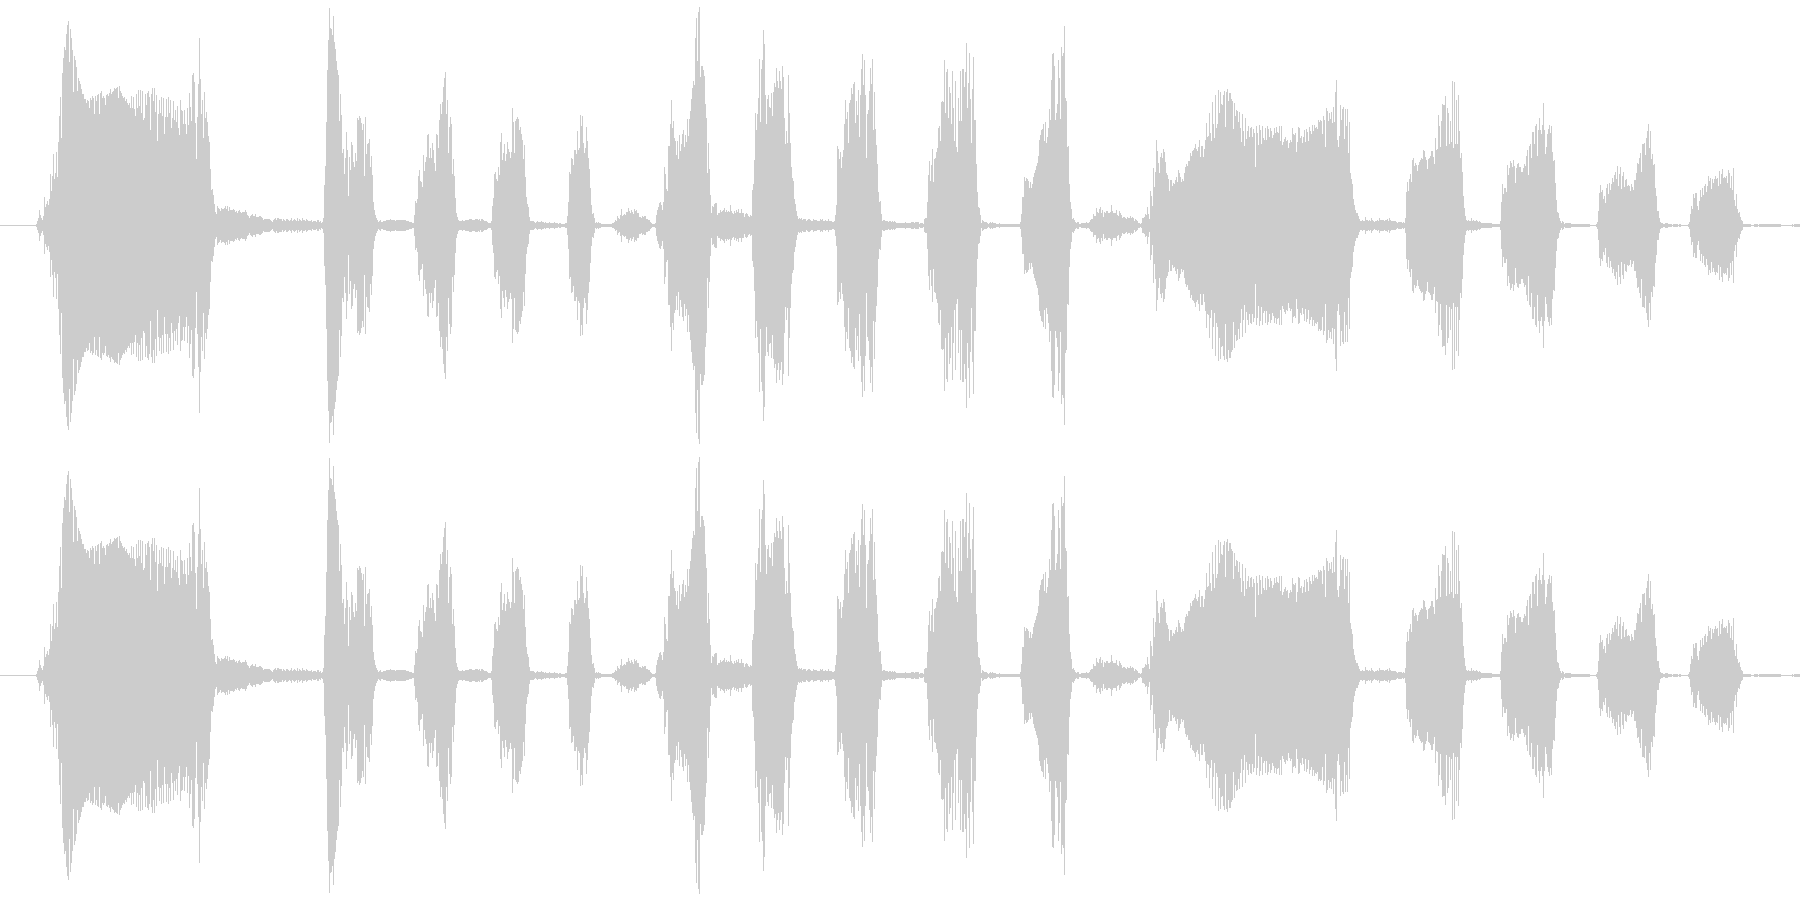 Long Laugh Voice_Malの未再生の波形